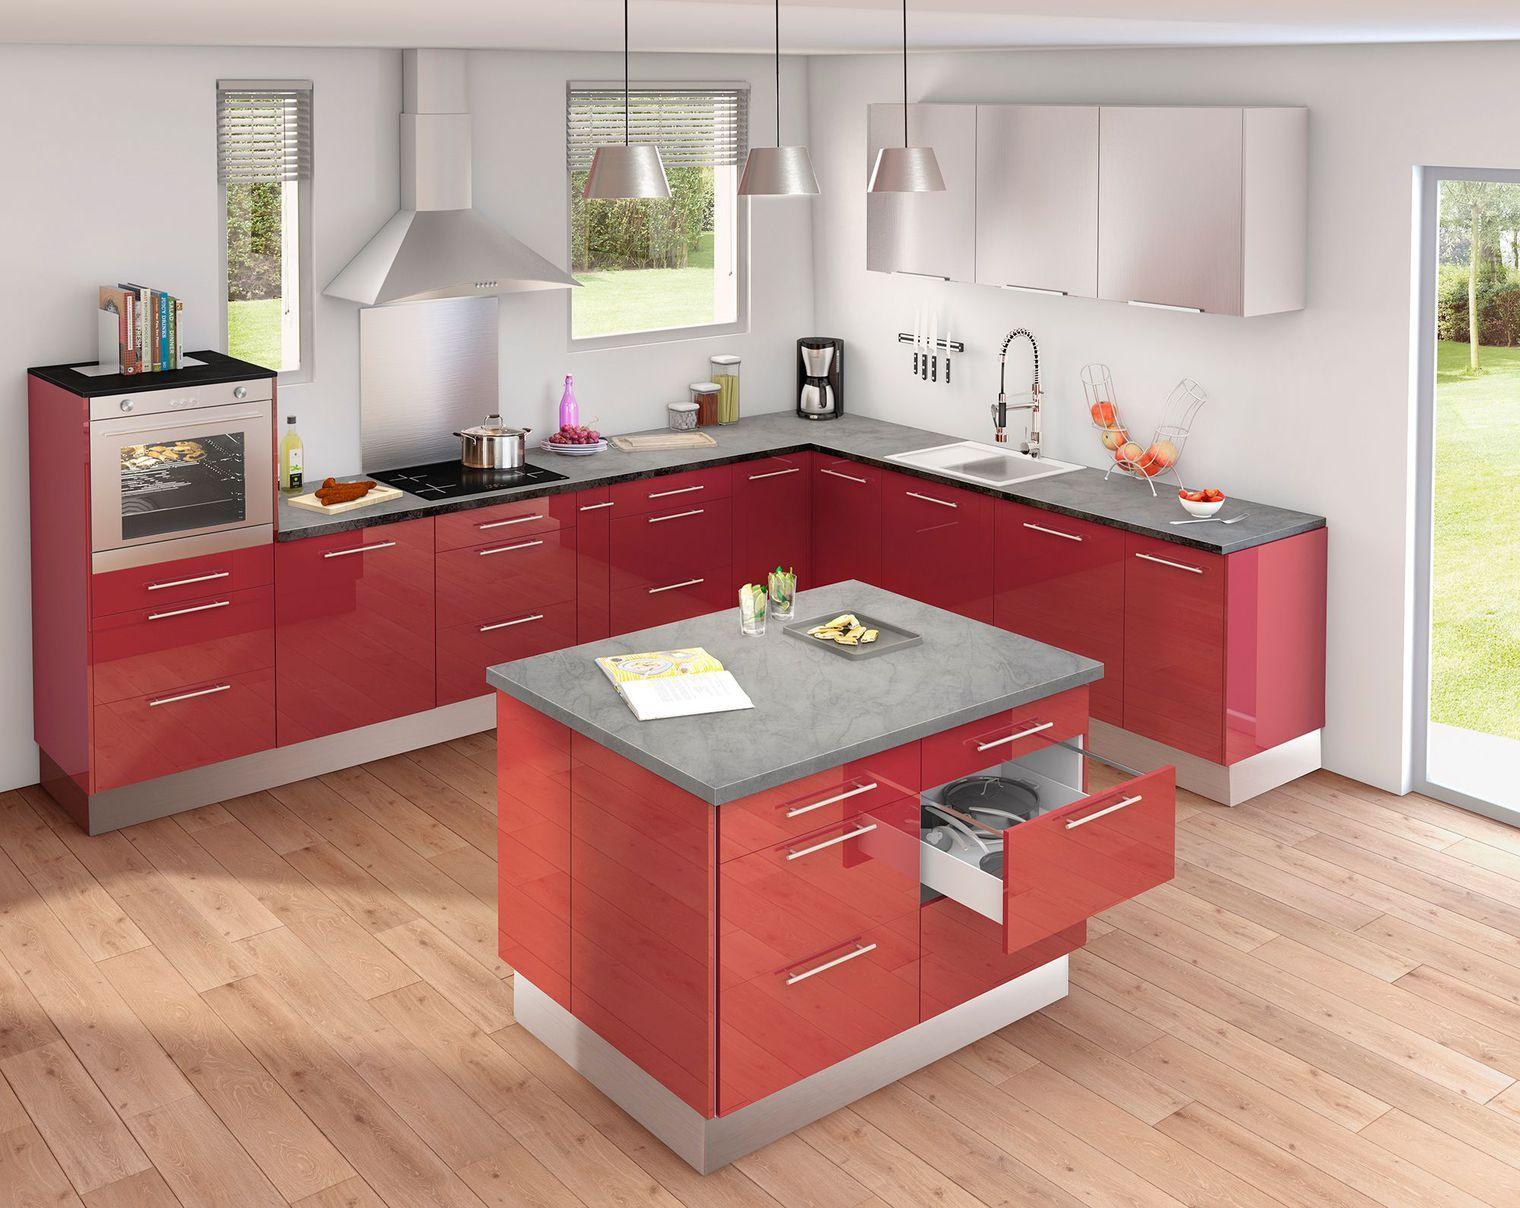 cuisine-modele-nina-rouge-de-brico-depot-ilot-central_5533241